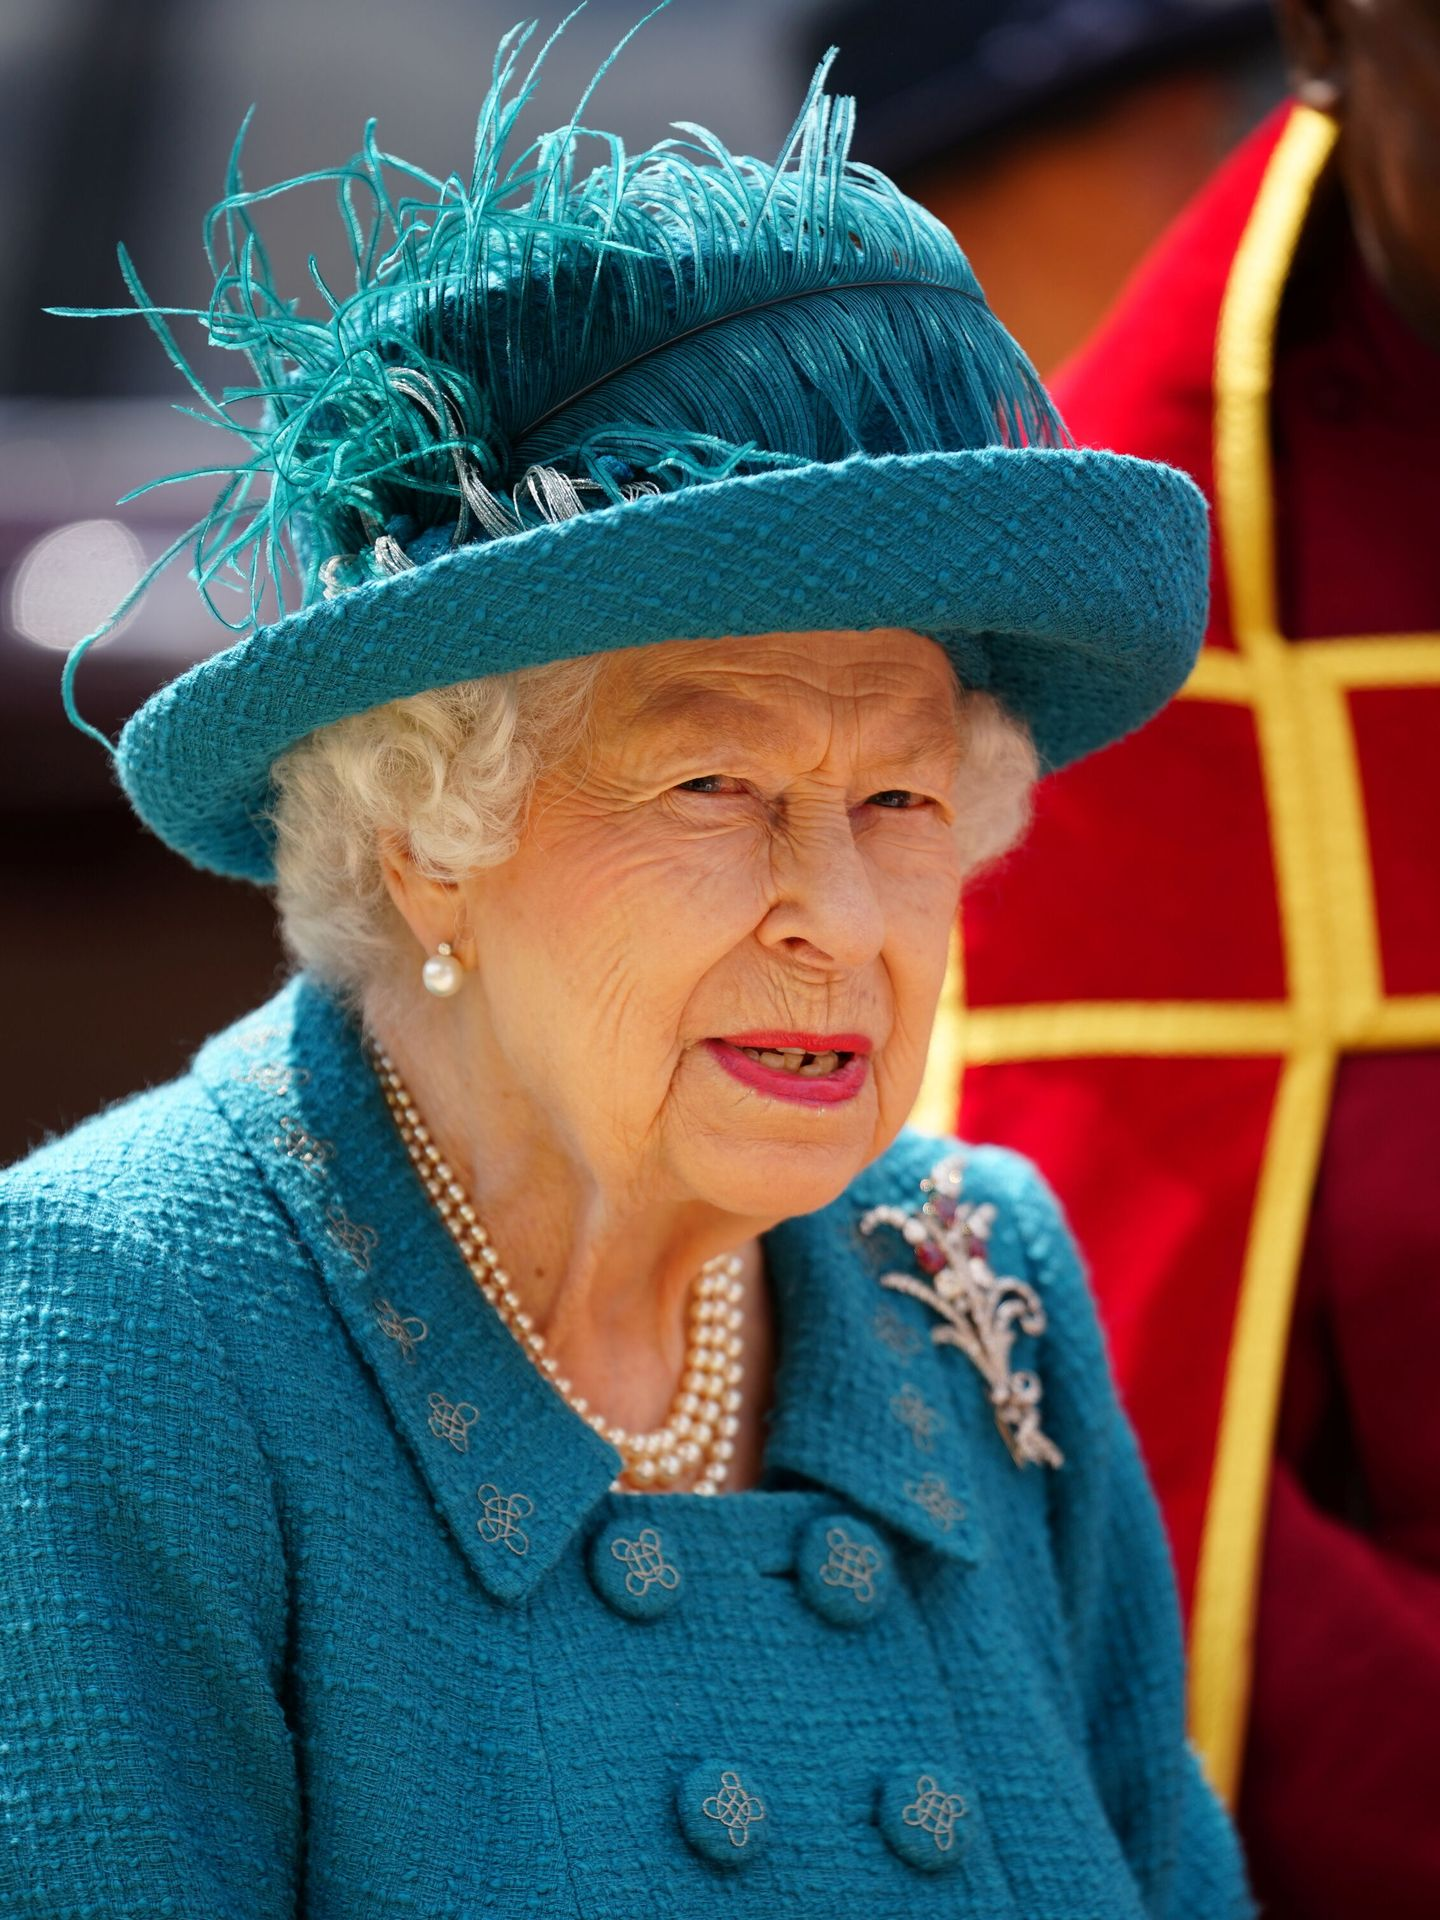 La reina Isabel, en una imagen reciente. (Reuters)